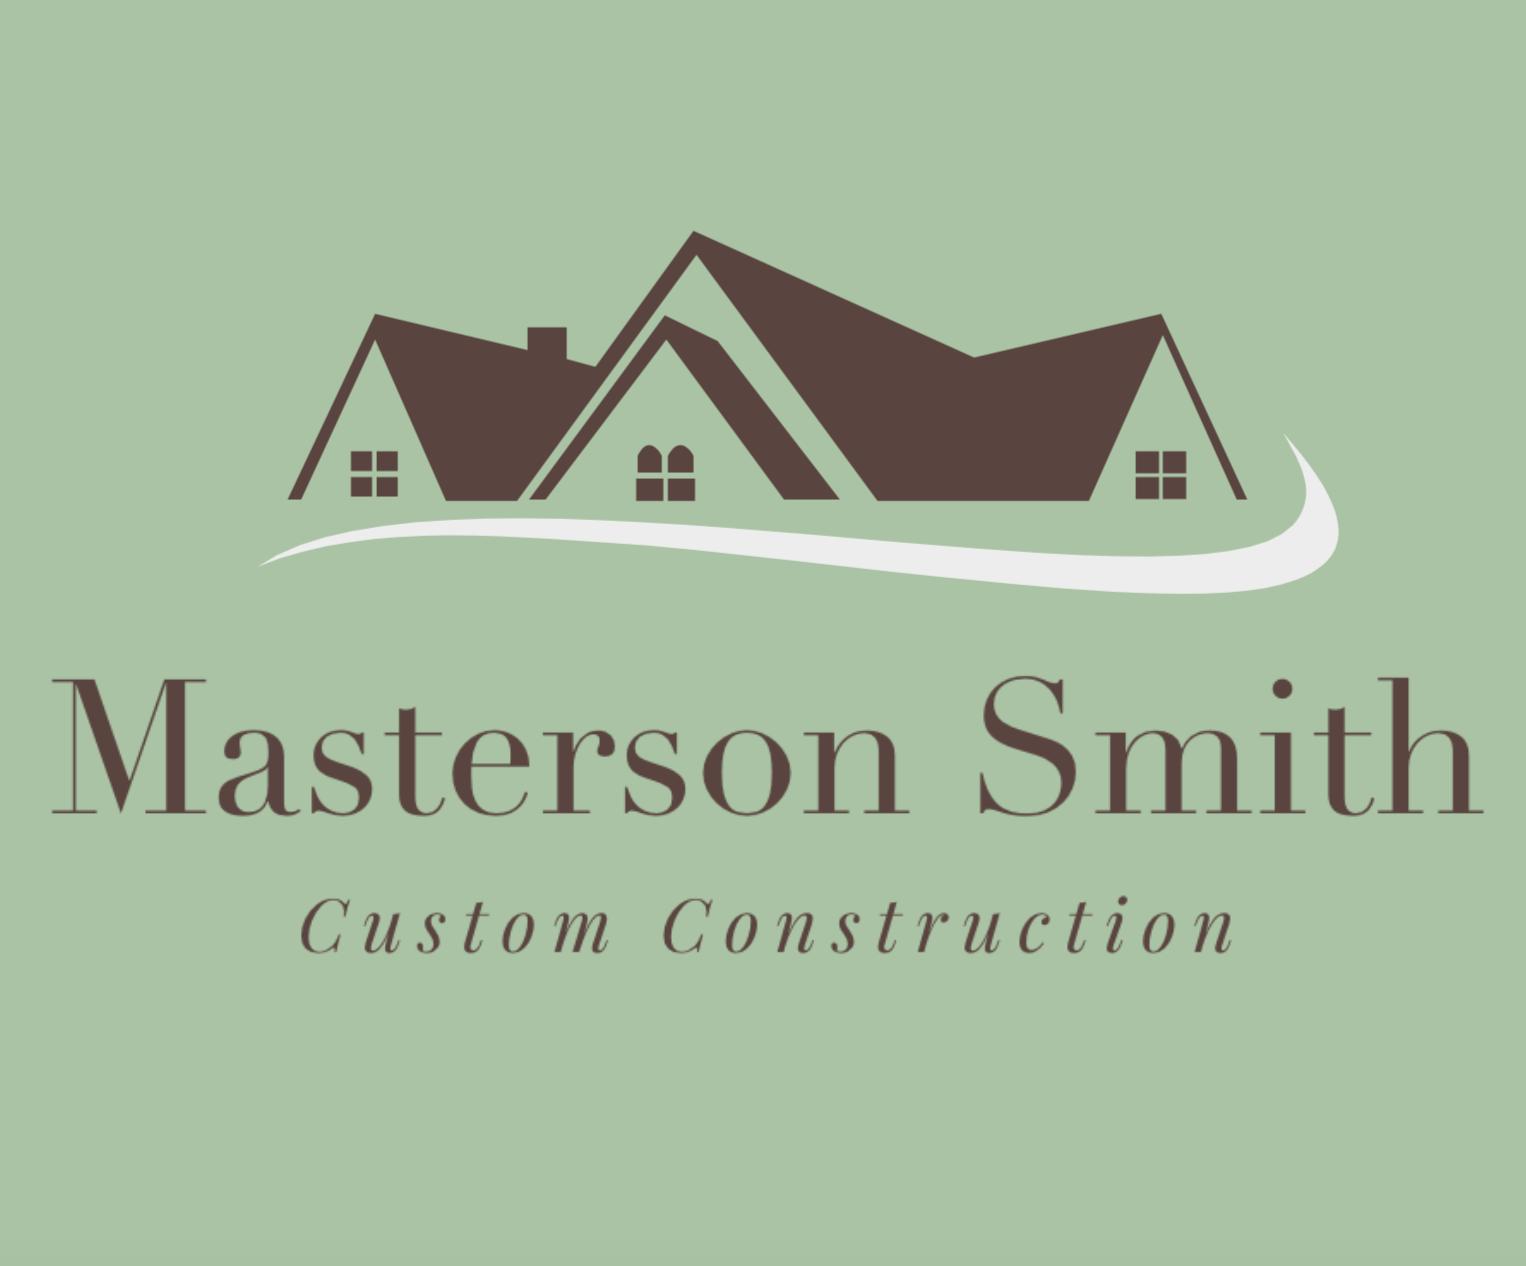 Logo made with DesignEvo - Masterson Smith